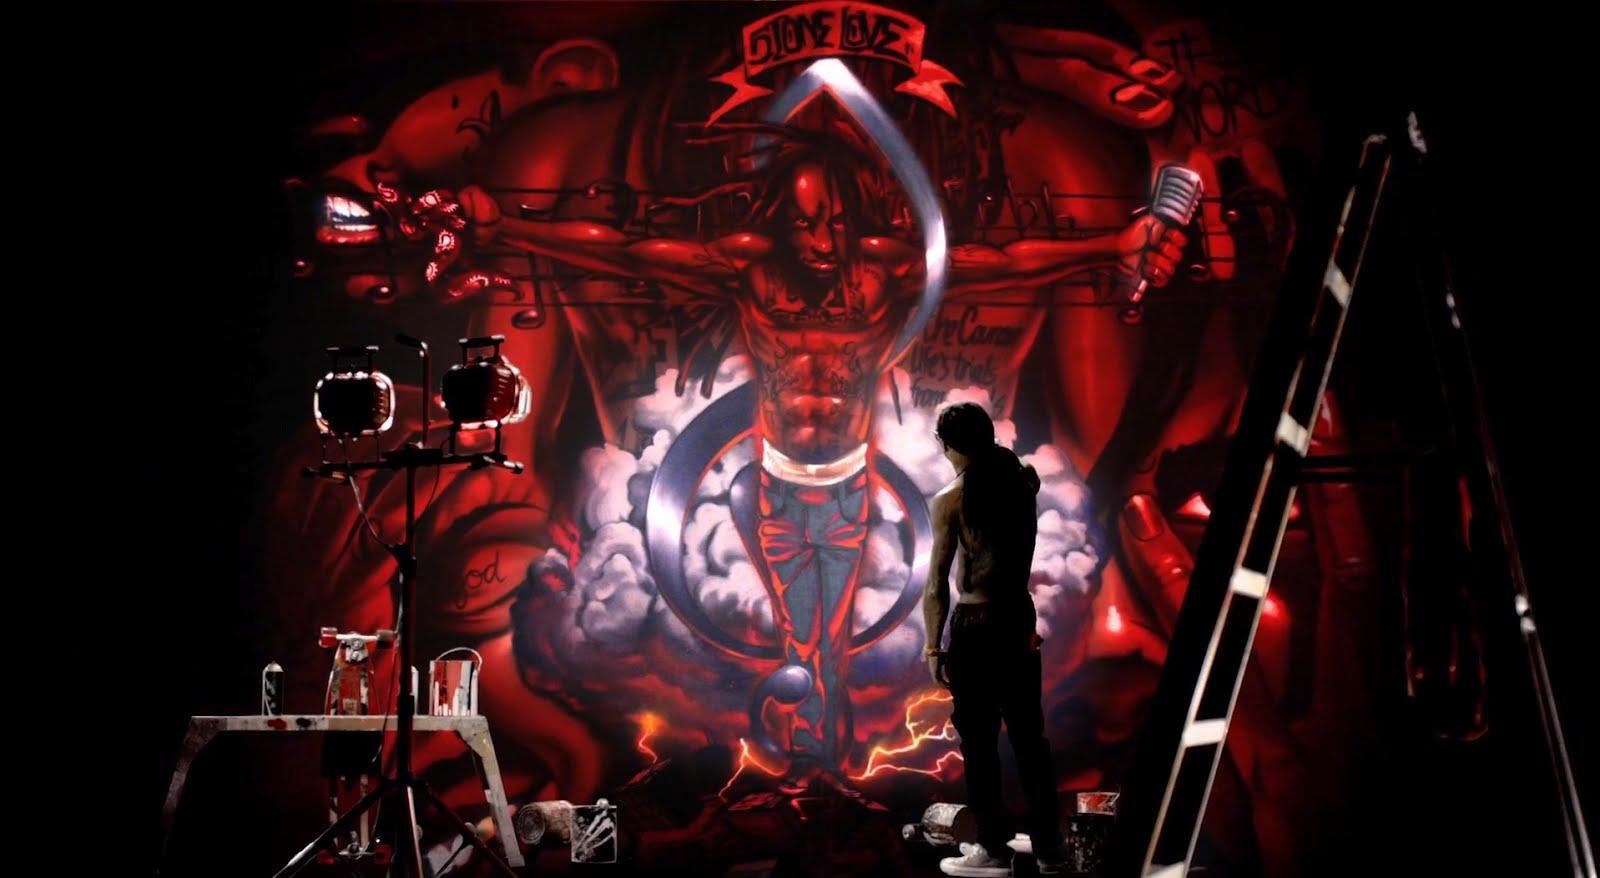 All New Pix1: Lil Wayne Wallpaper For Facebook